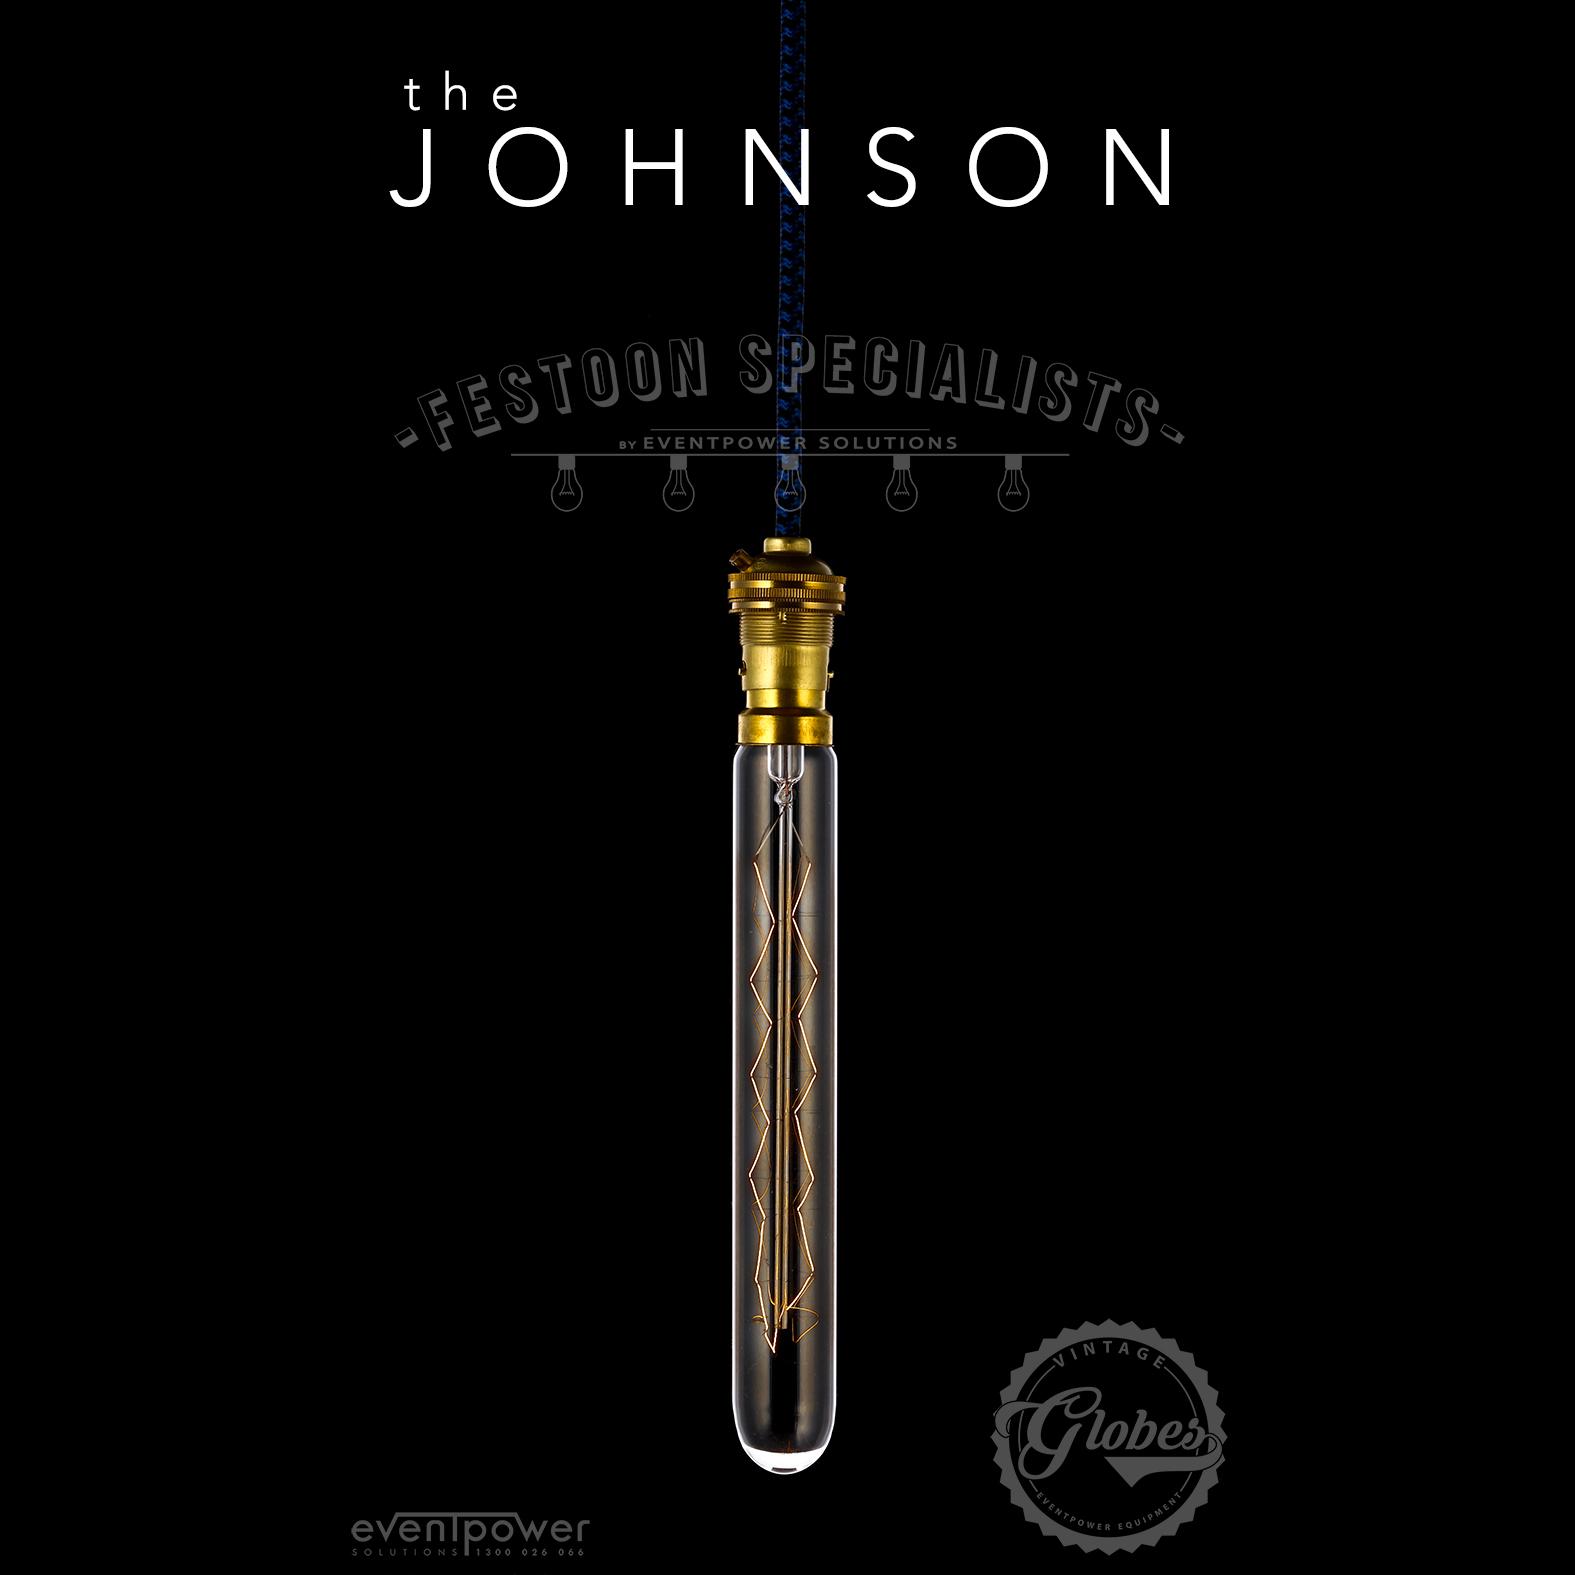 Festoon_Specialists-Johnson.jpg